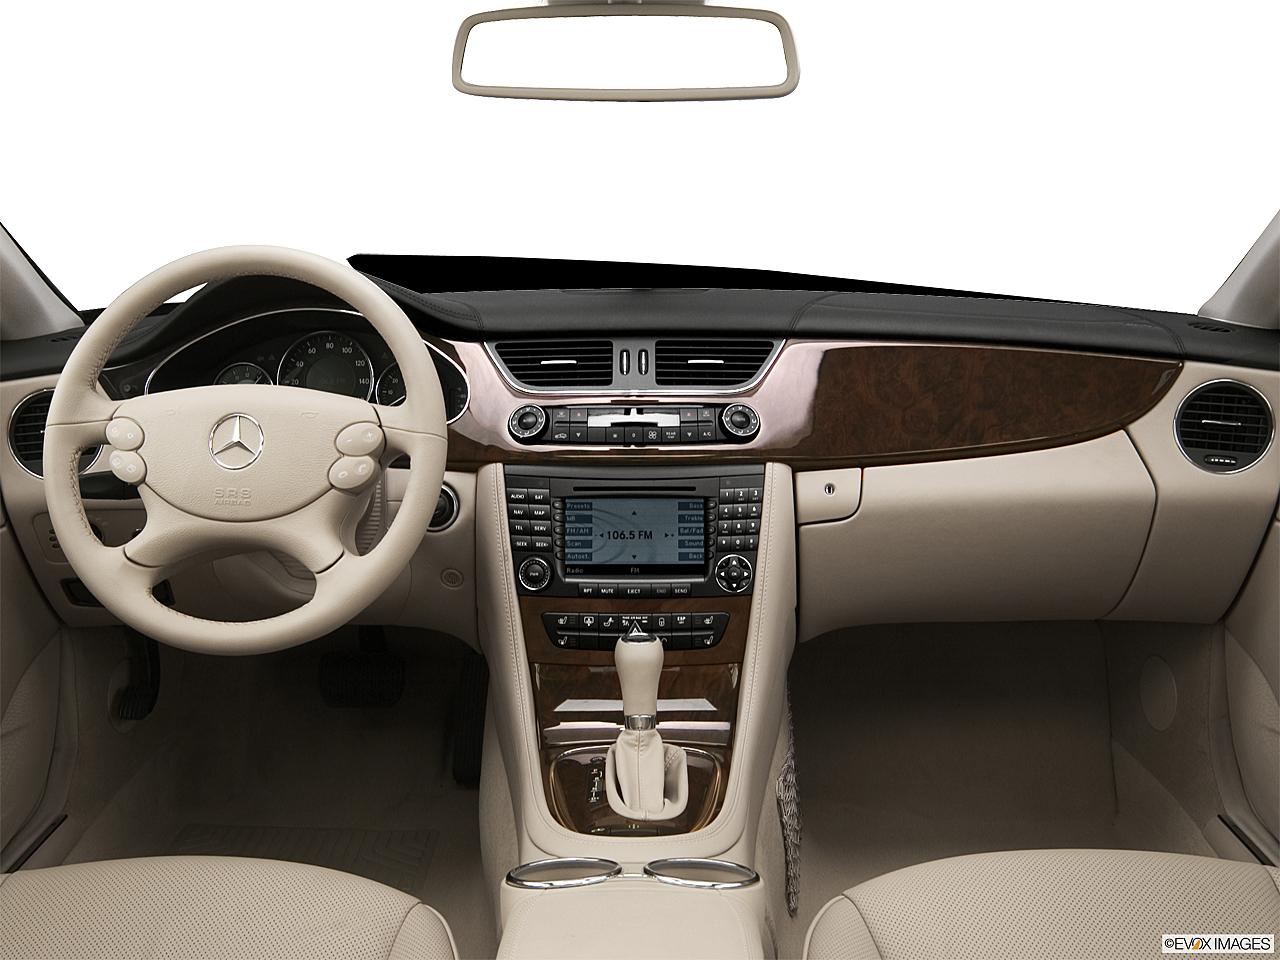 2006 Mercedes Benz Cls 500 4dr Sedan Research Groovecar Class Cls500 Centered Wide Dash Shot